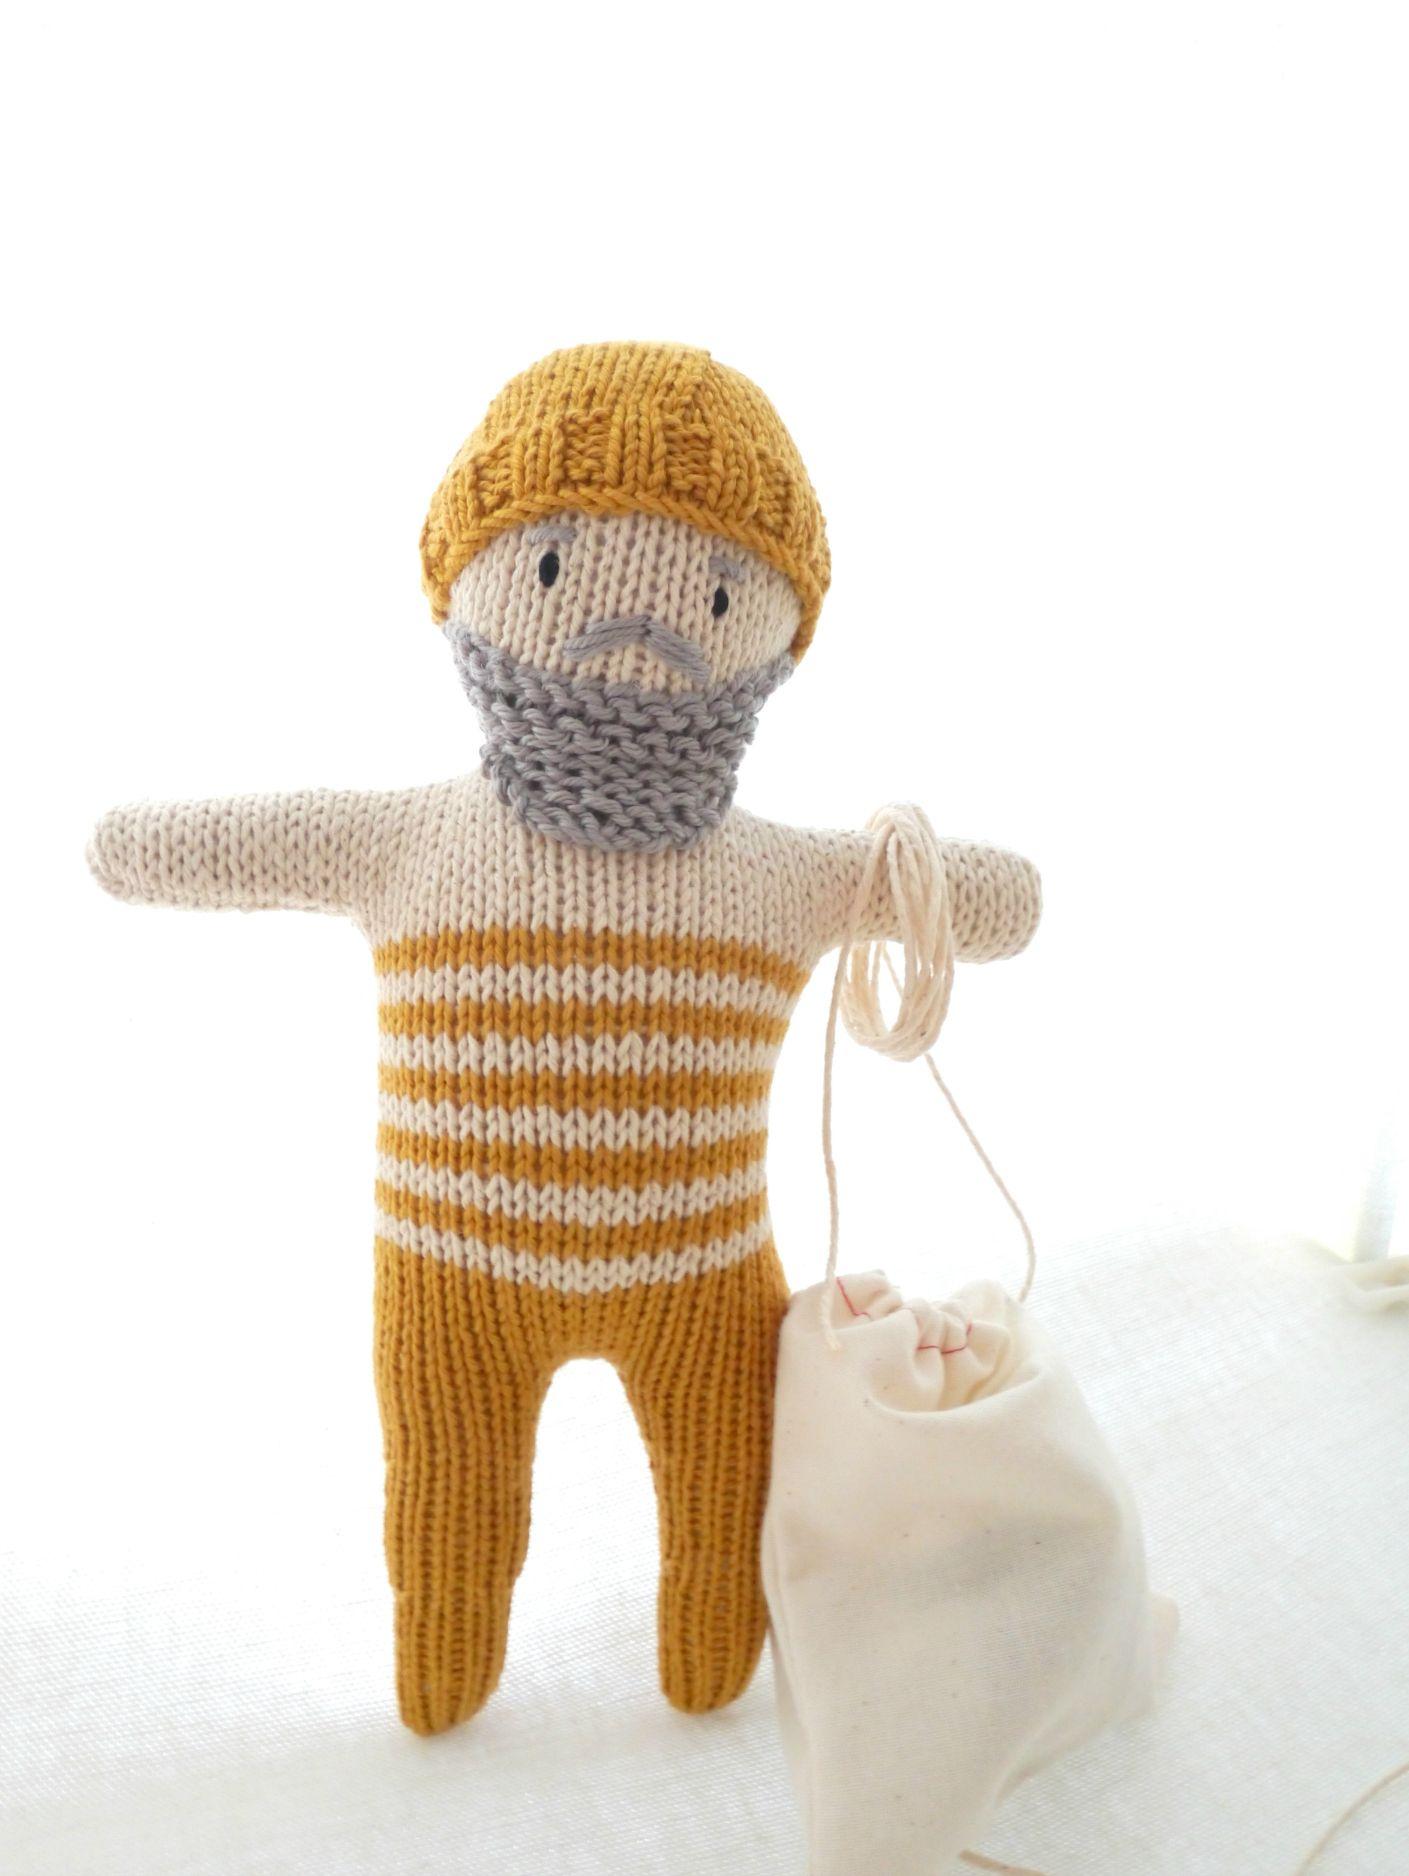 MR. FISHERMAN handmade doll by Paula de Lemos